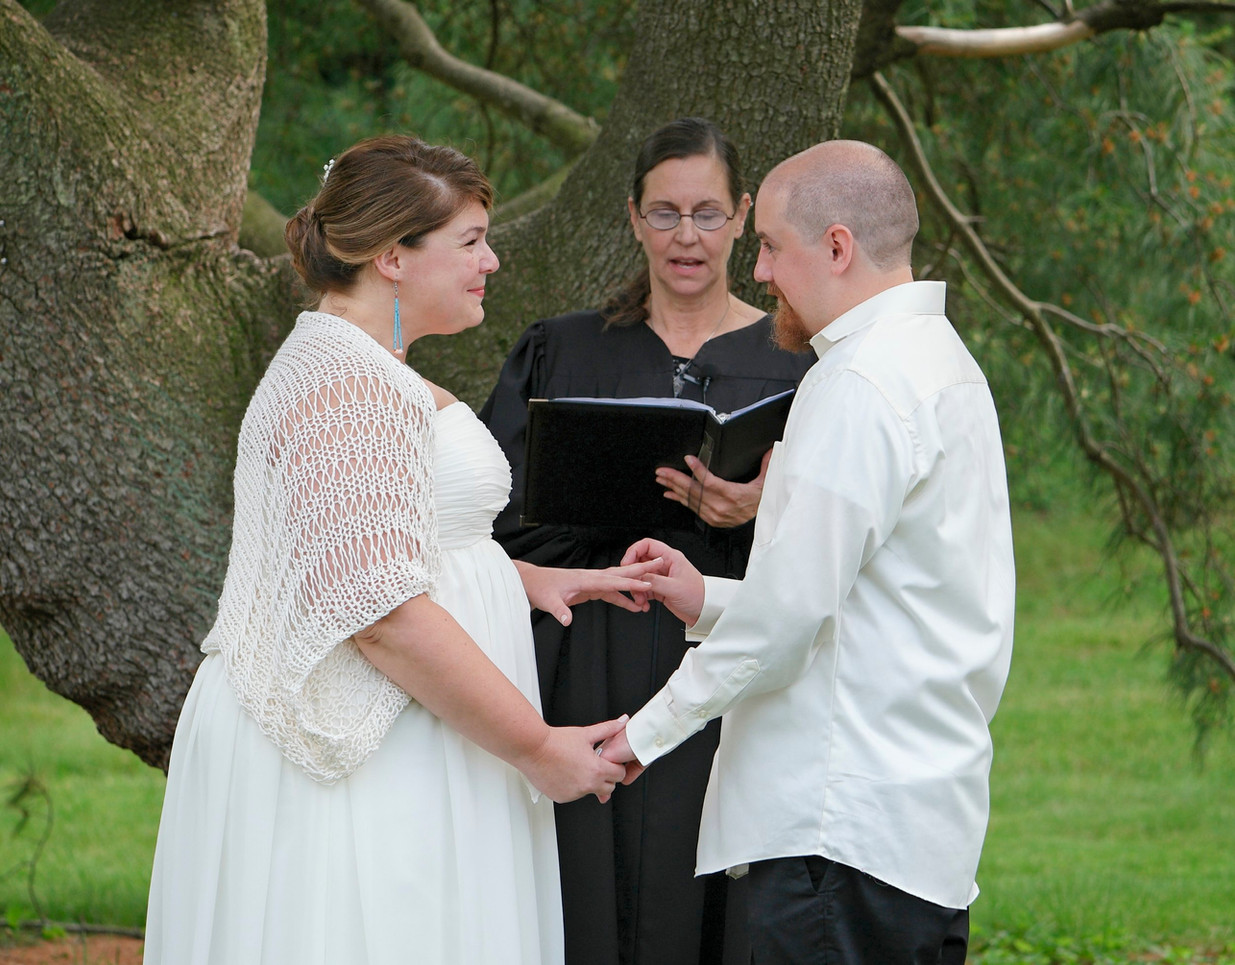 Wedding+-+Alter+1226.jpg